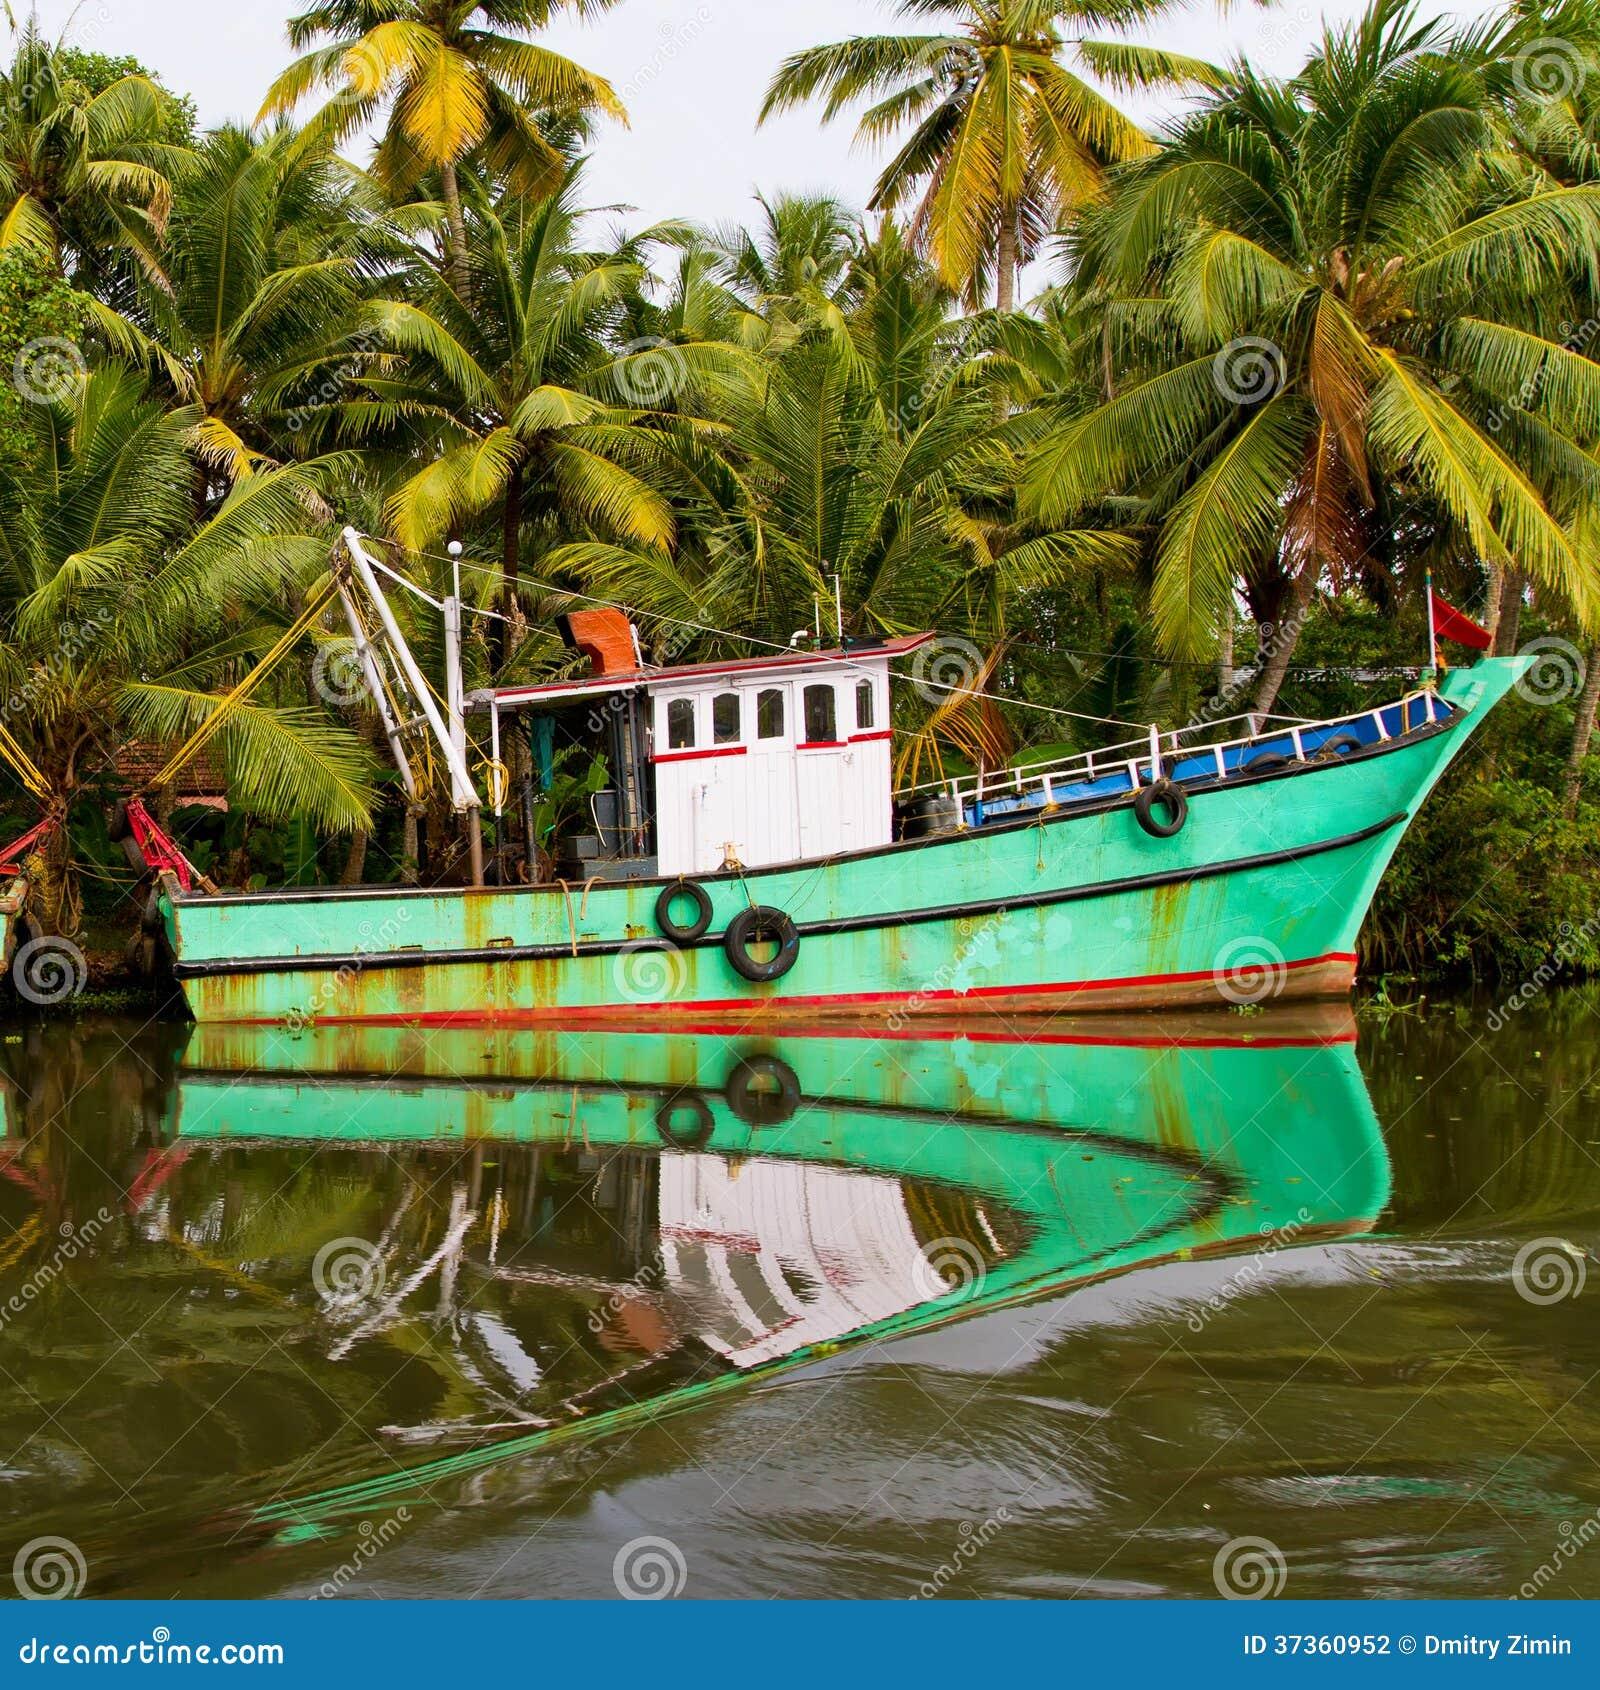 Indian Fishing Boat Beautiful Reflection Water Famous Backwaters Kerala Kochi Kerala India 37360952 Jpg 1300 1390 With Images Kerala India Fishing Boats Kochi